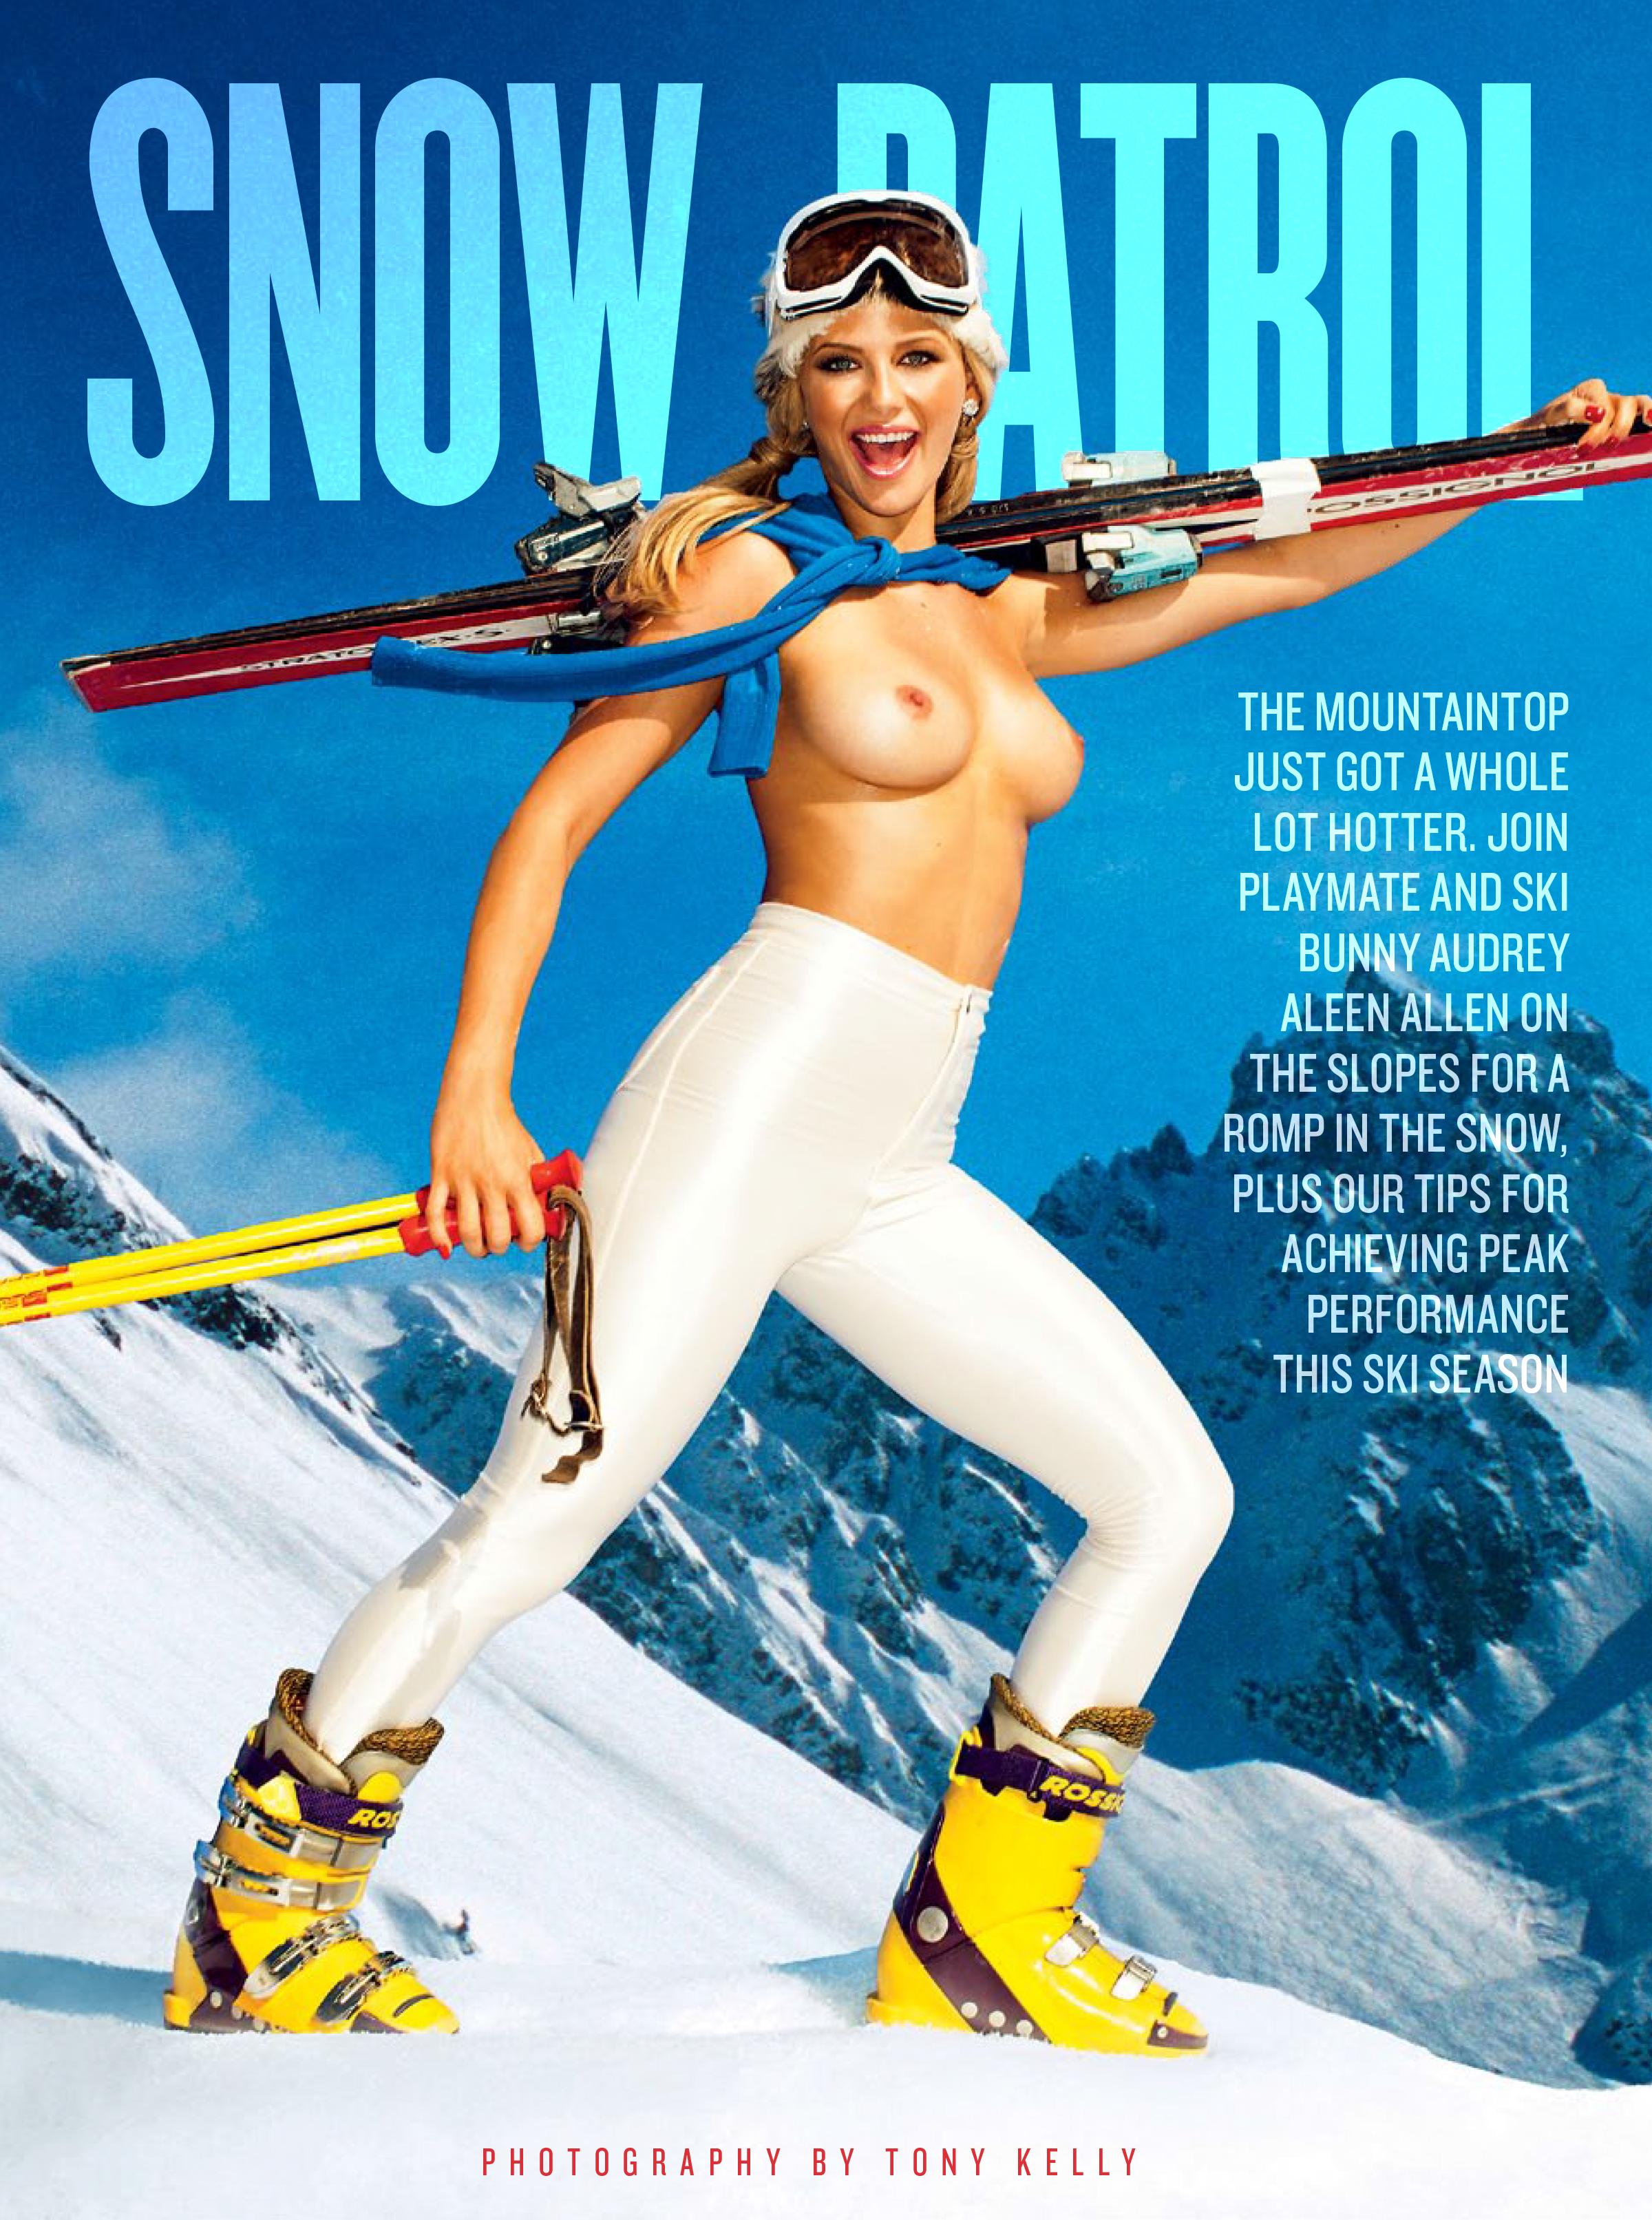 JAN_FEB FEAT_Snow Patrol-1.jpg